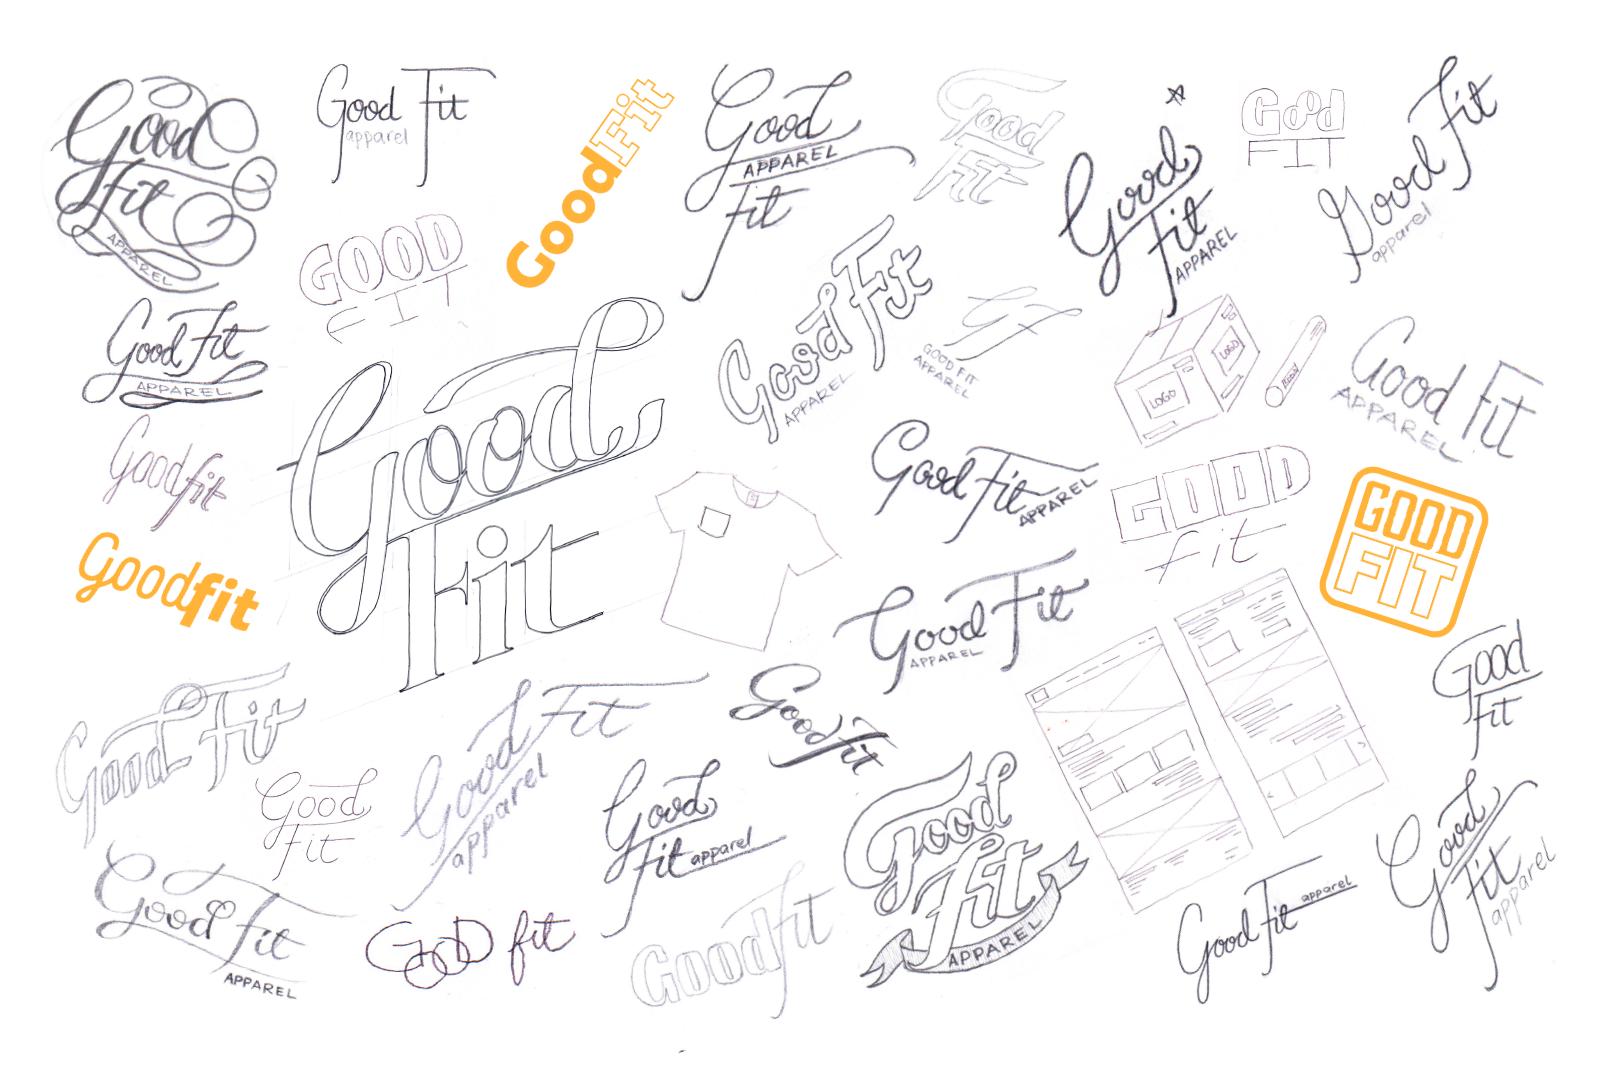 Goodfit-Process.png